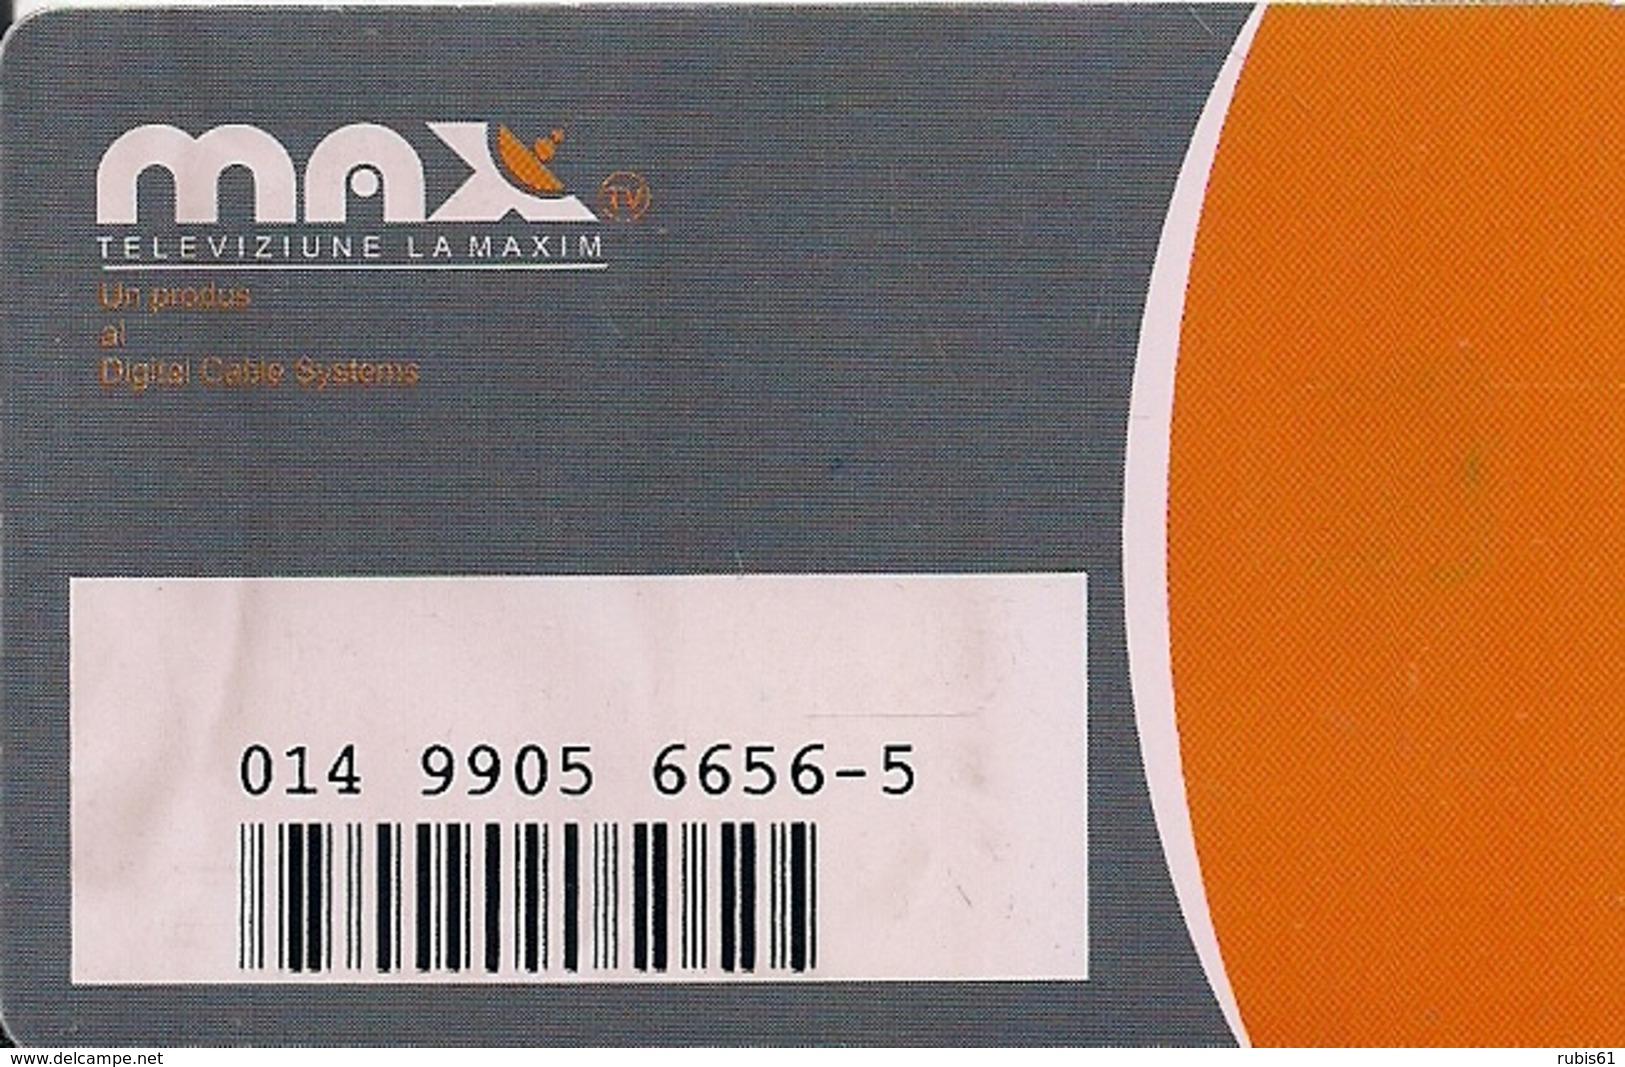 TARJETA TELEVIZIUNE LA MAXIM - Phonecards